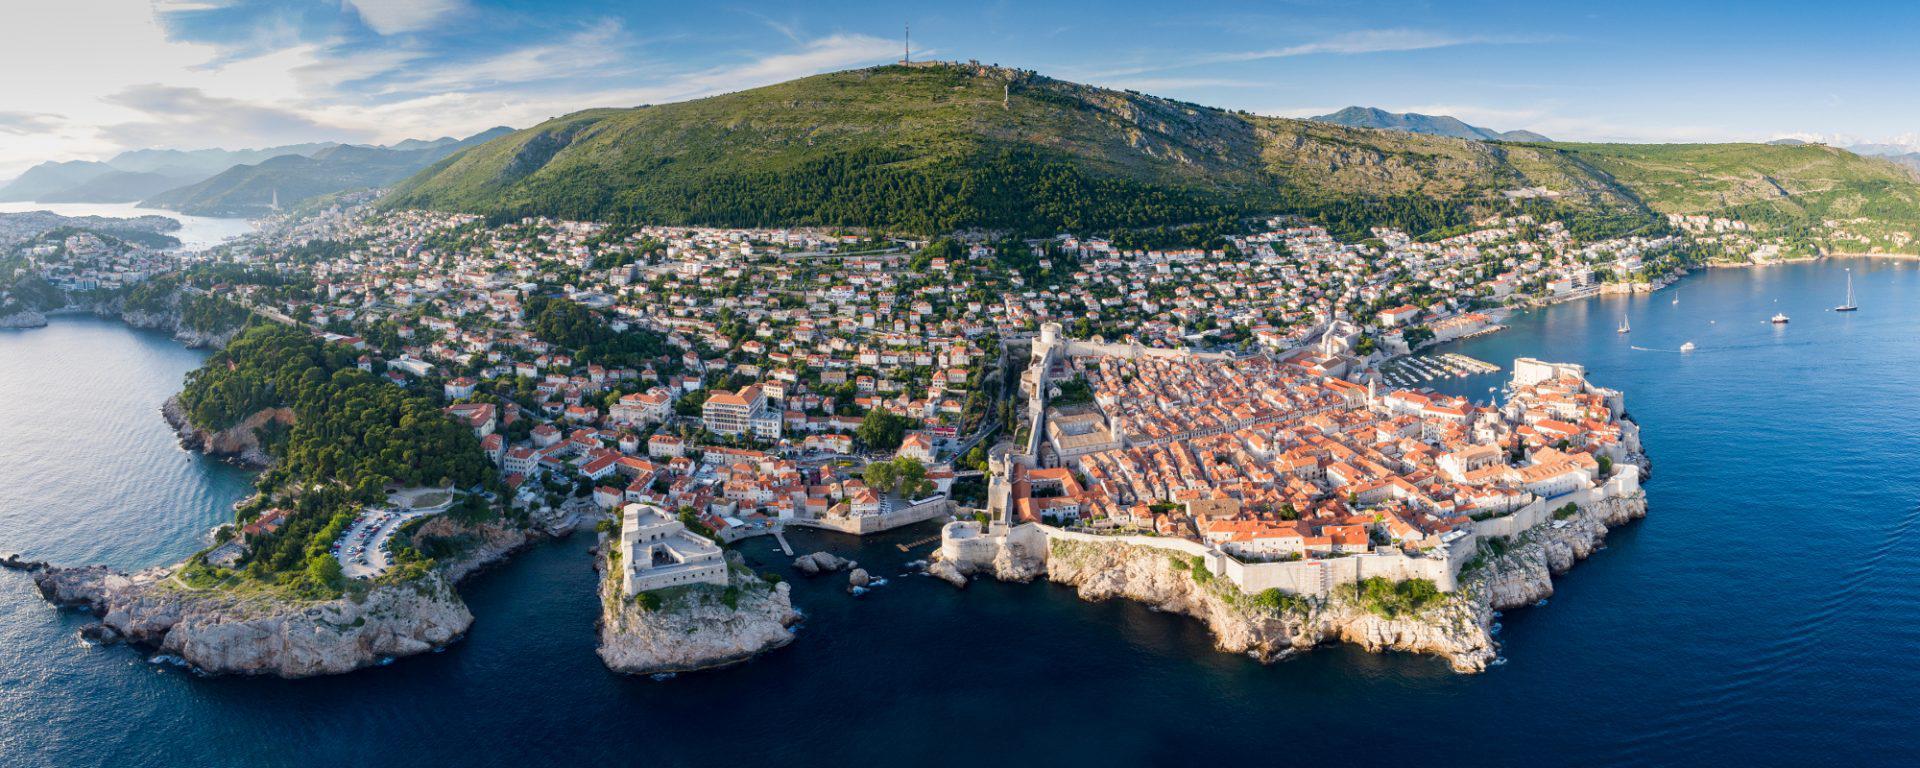 dubrovnik1 Μέρη που αξίζει να επισκεφτείς μέσα στο 2017 (μέρος β')